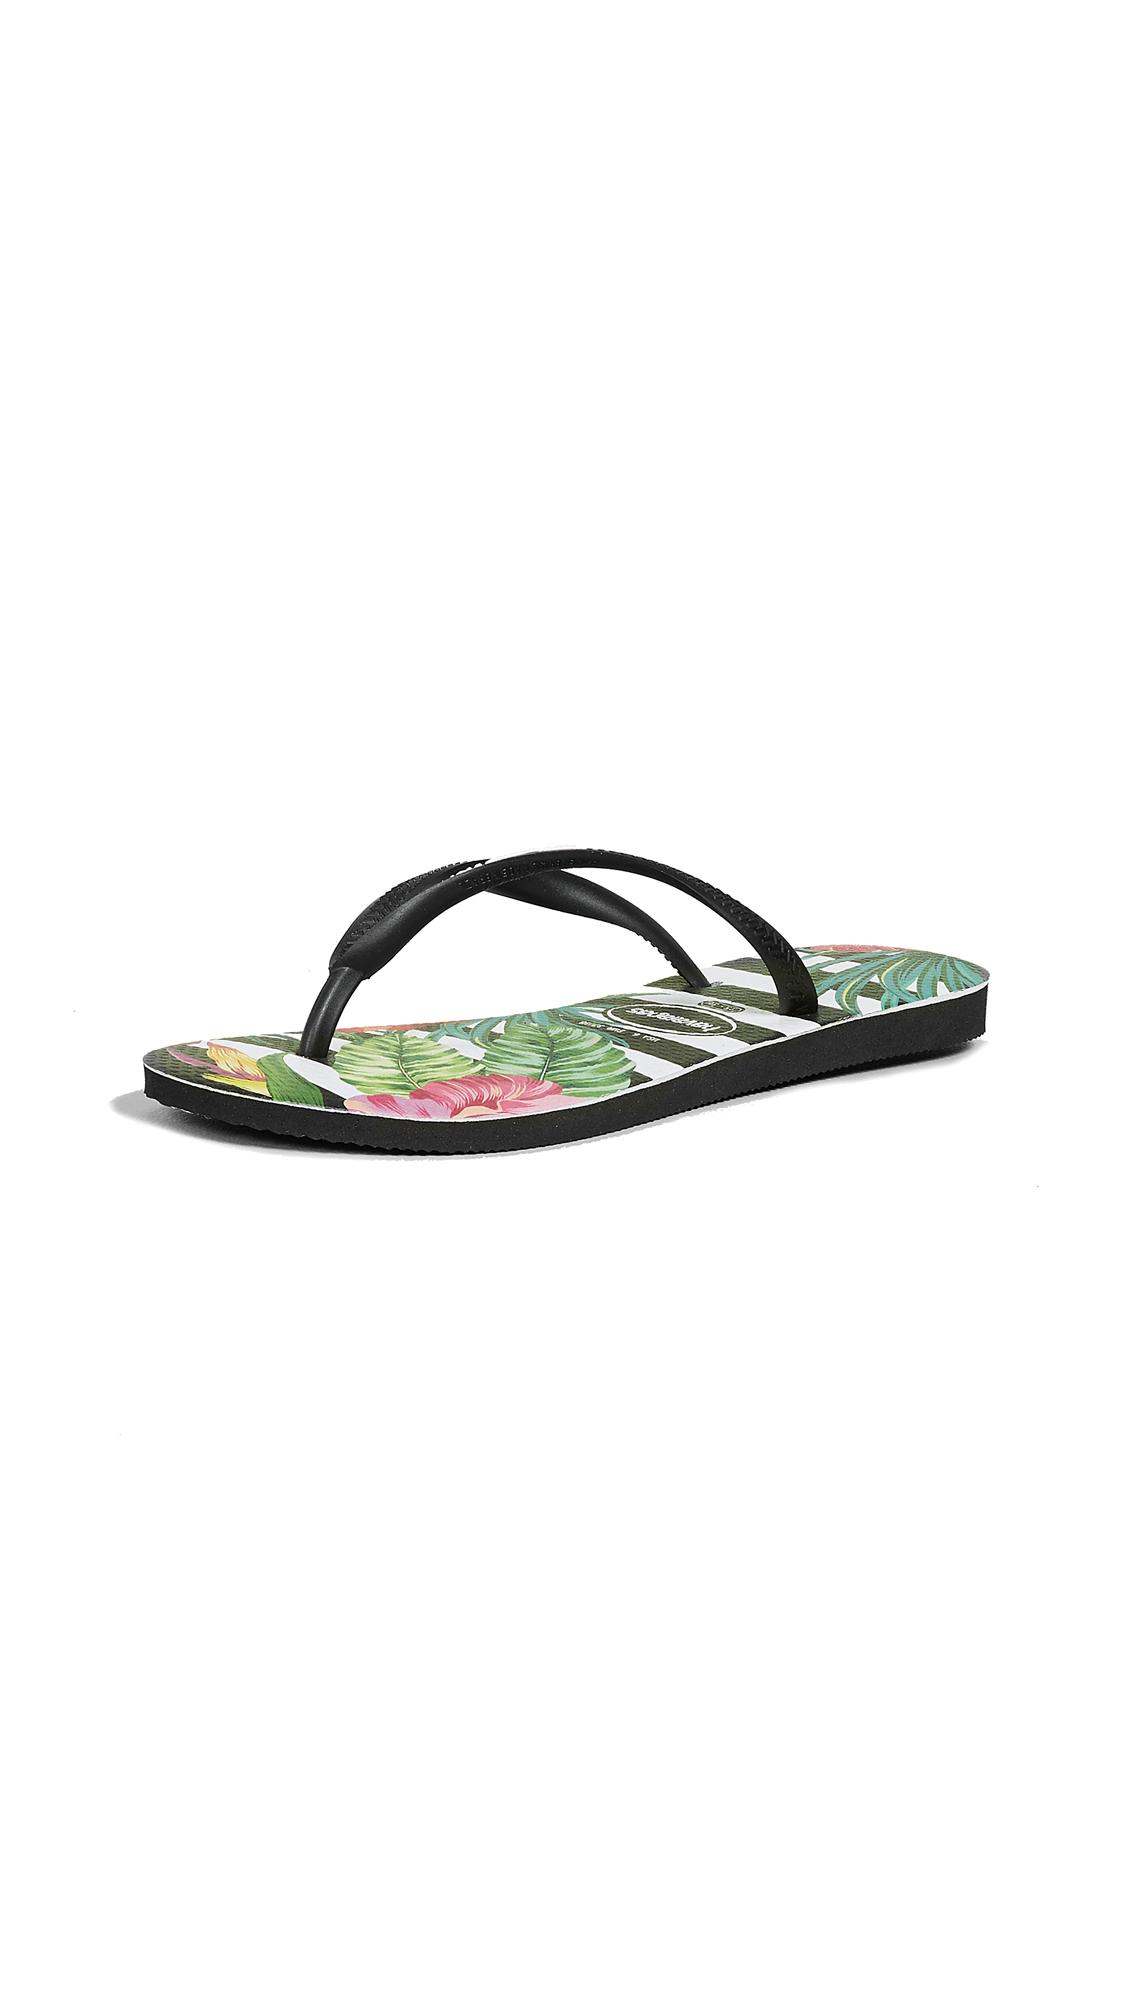 Havaianas Slim Tropical Floral Flip Flops - Black/Black/Imperial Palace